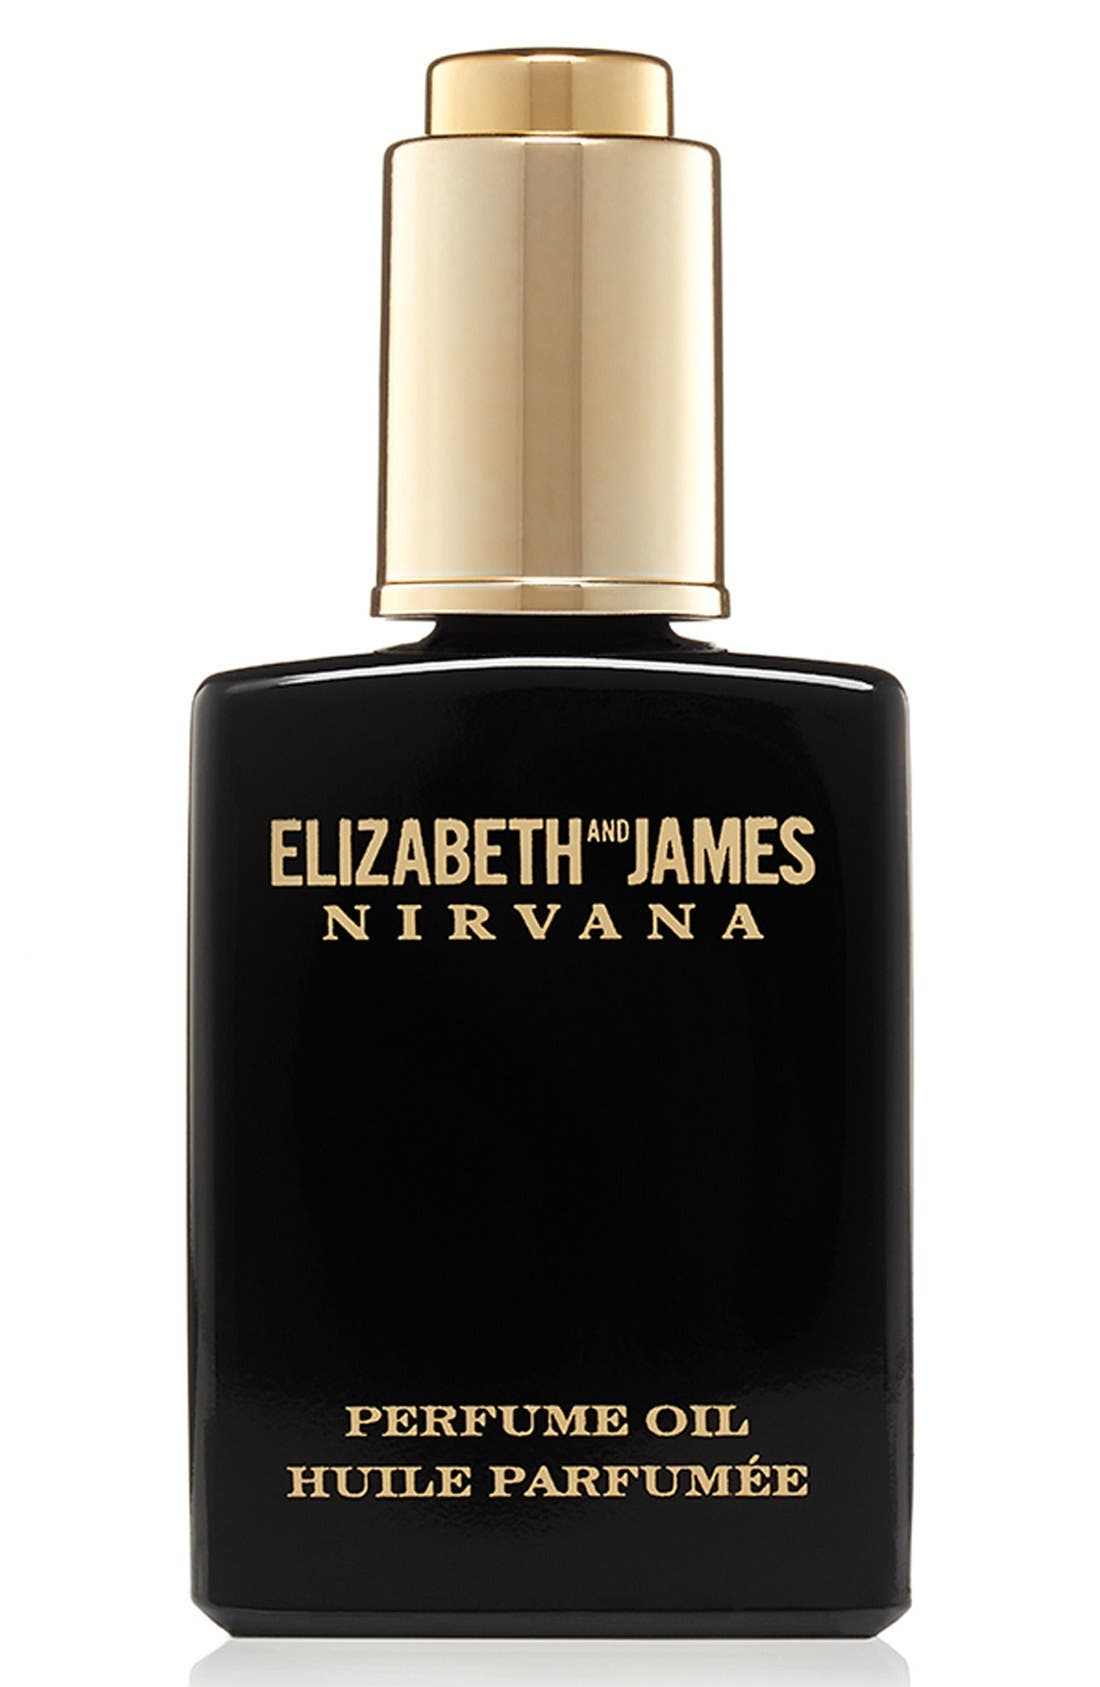 Elizabeth and James 'Nirvana Black' Perfume Oil